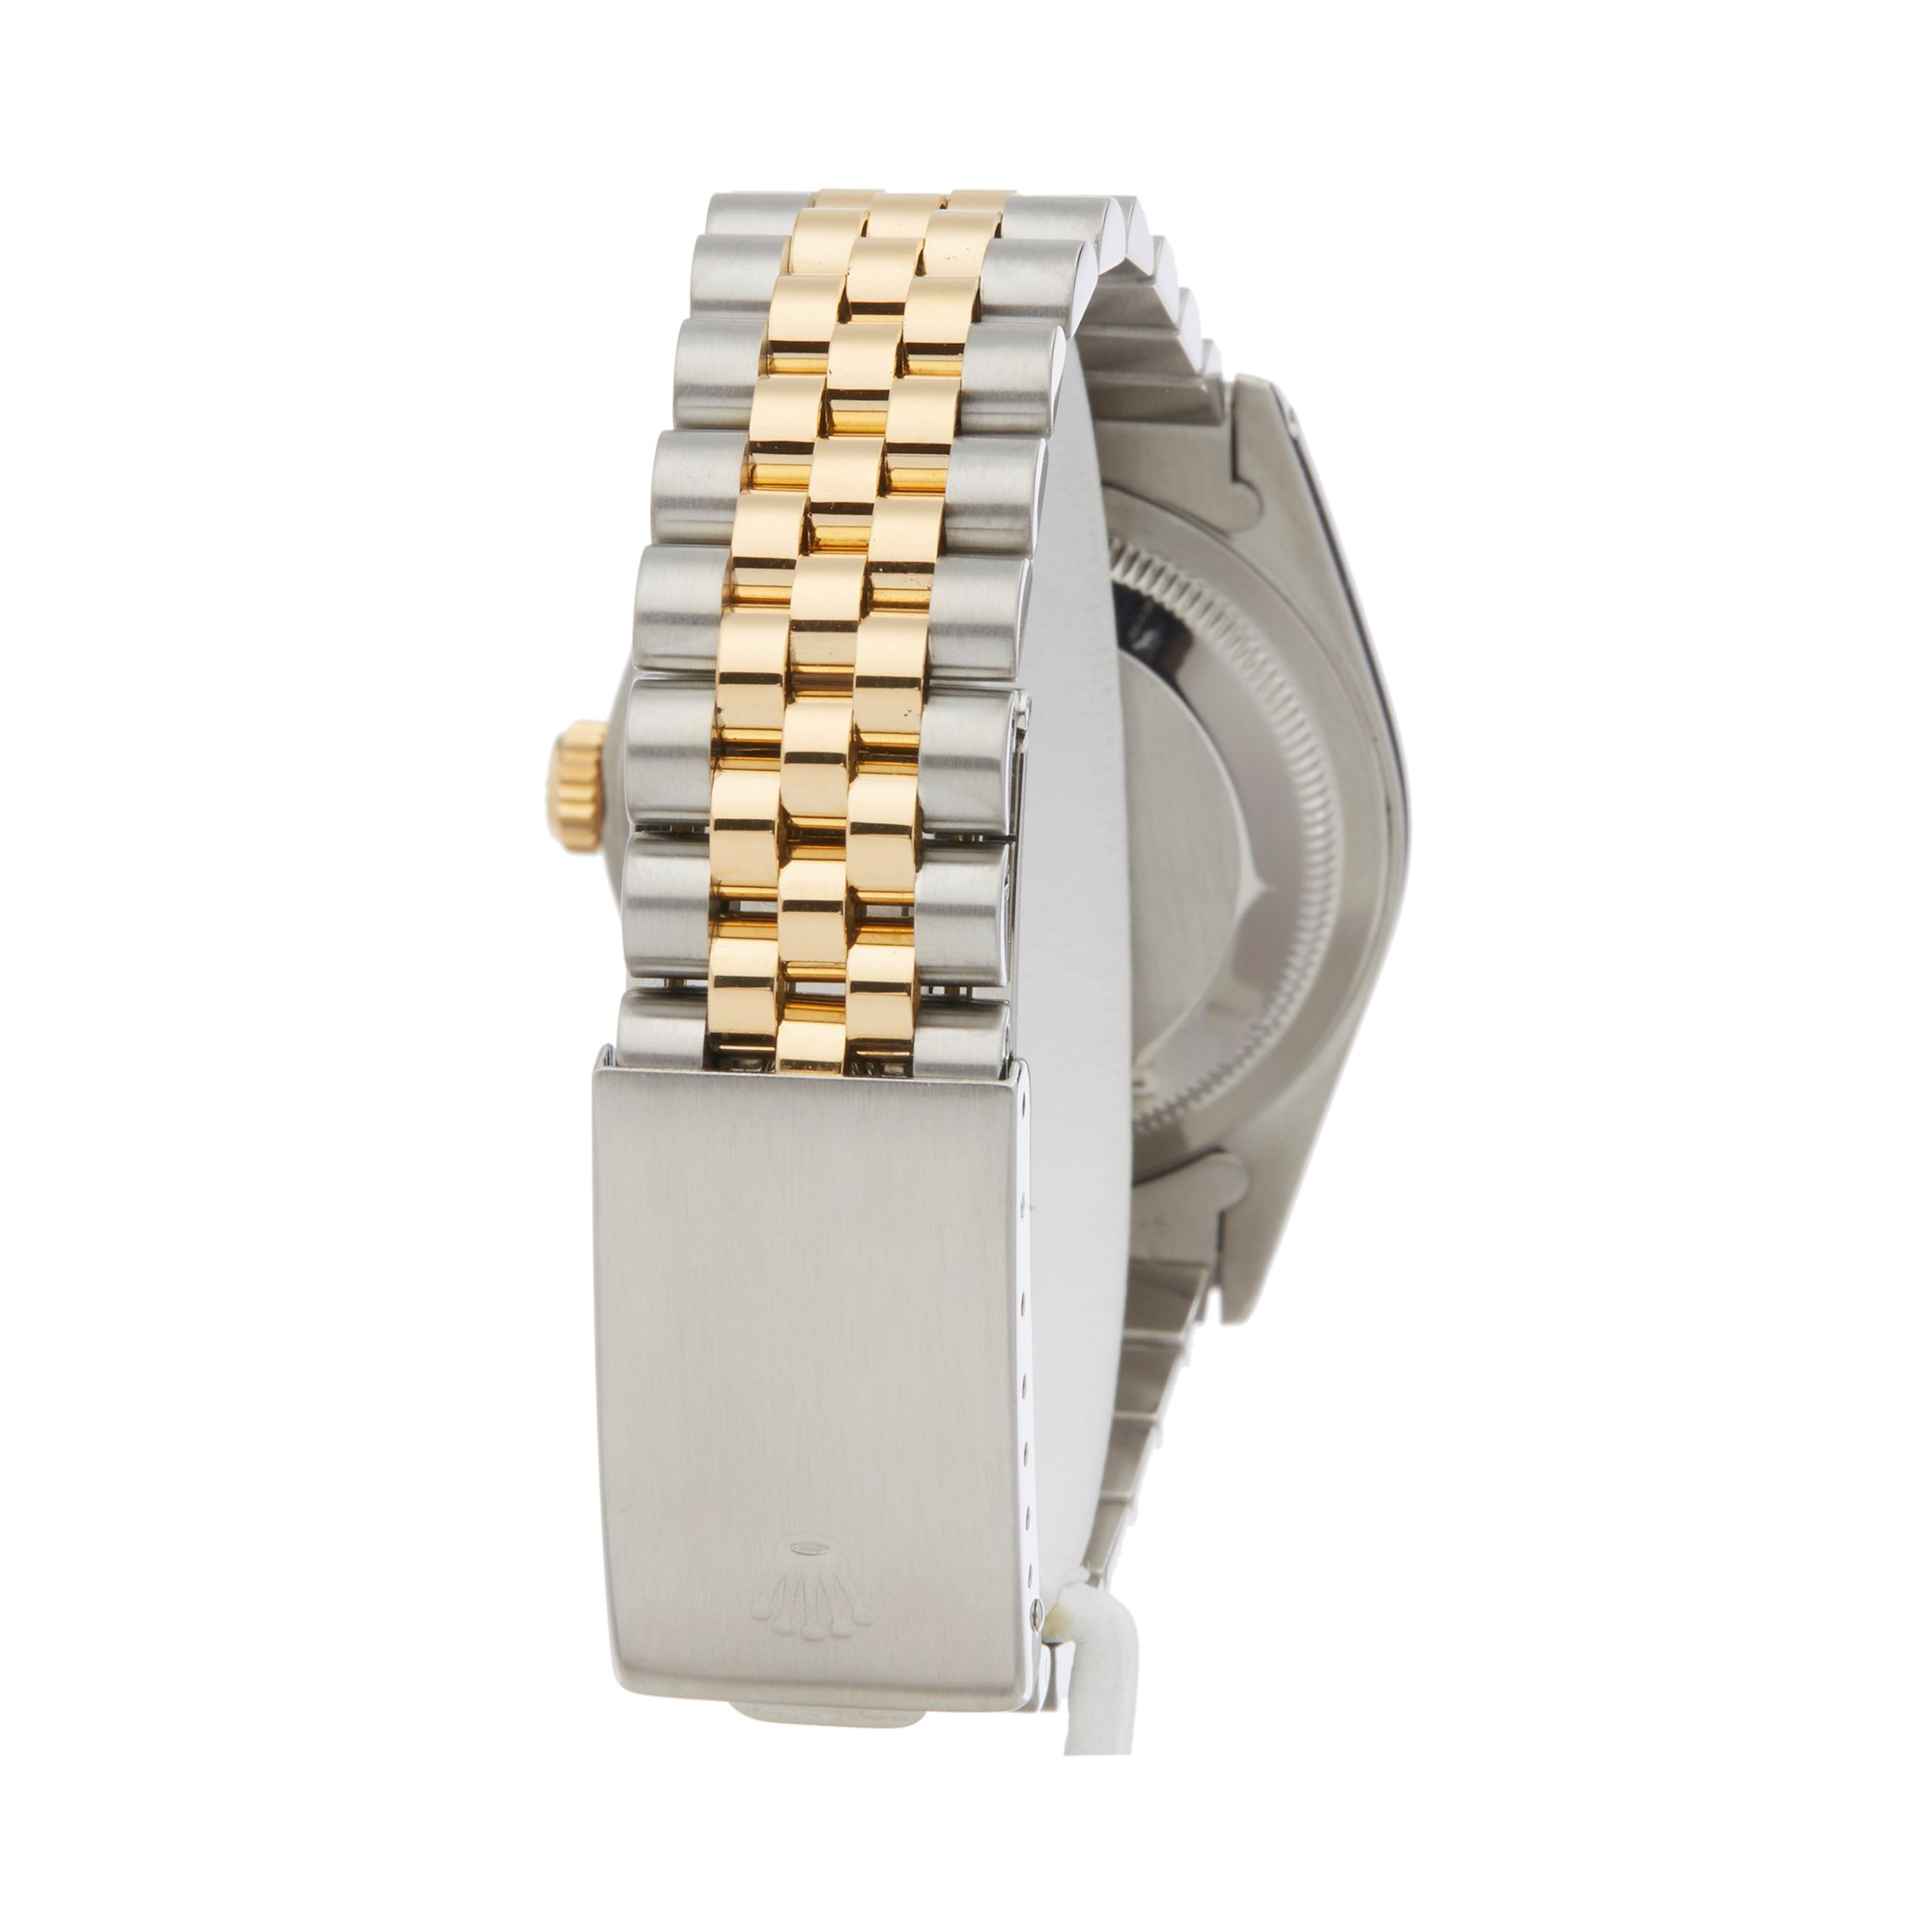 Rolex DateJust 36 Diamond Stainless Steel & Yellow Gold 16233